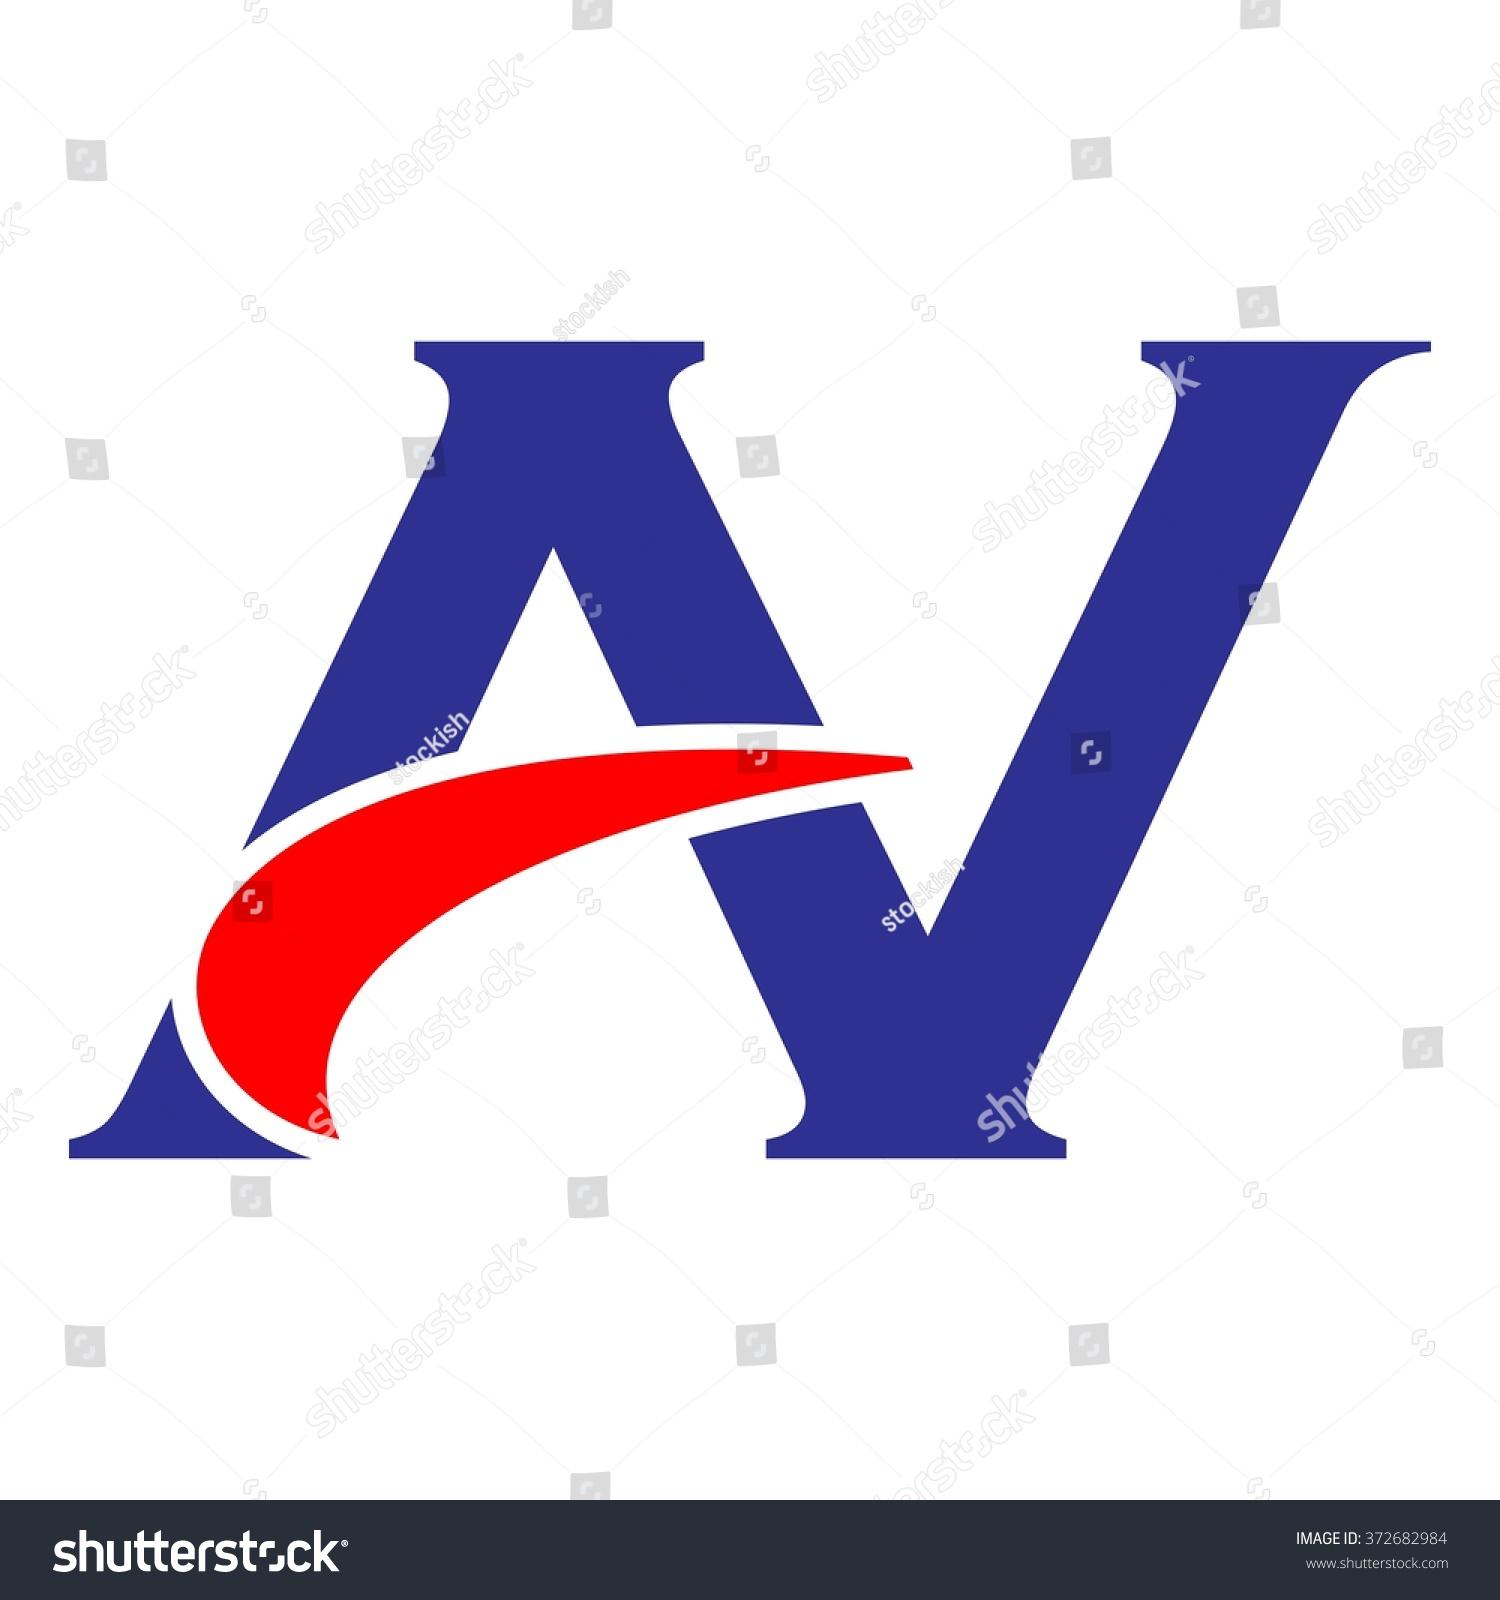 V Logo Vector Stock Vector 372682984 - Shutterstock